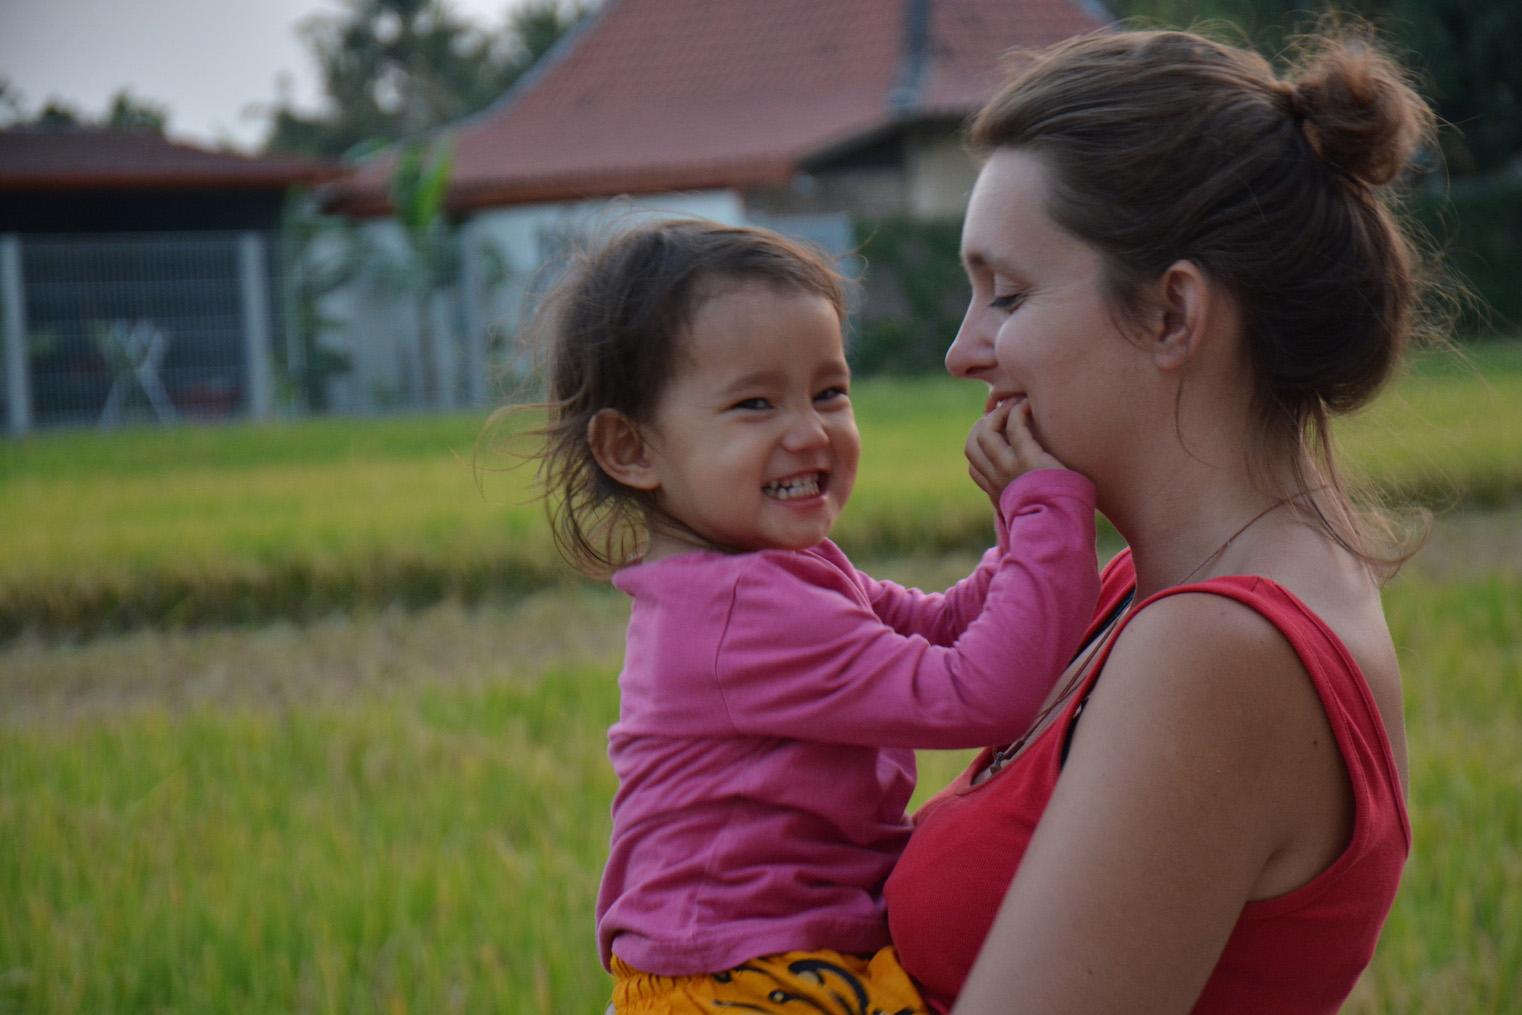 06.Matka Nomadka - podroz z dzieckiem - Indonezja